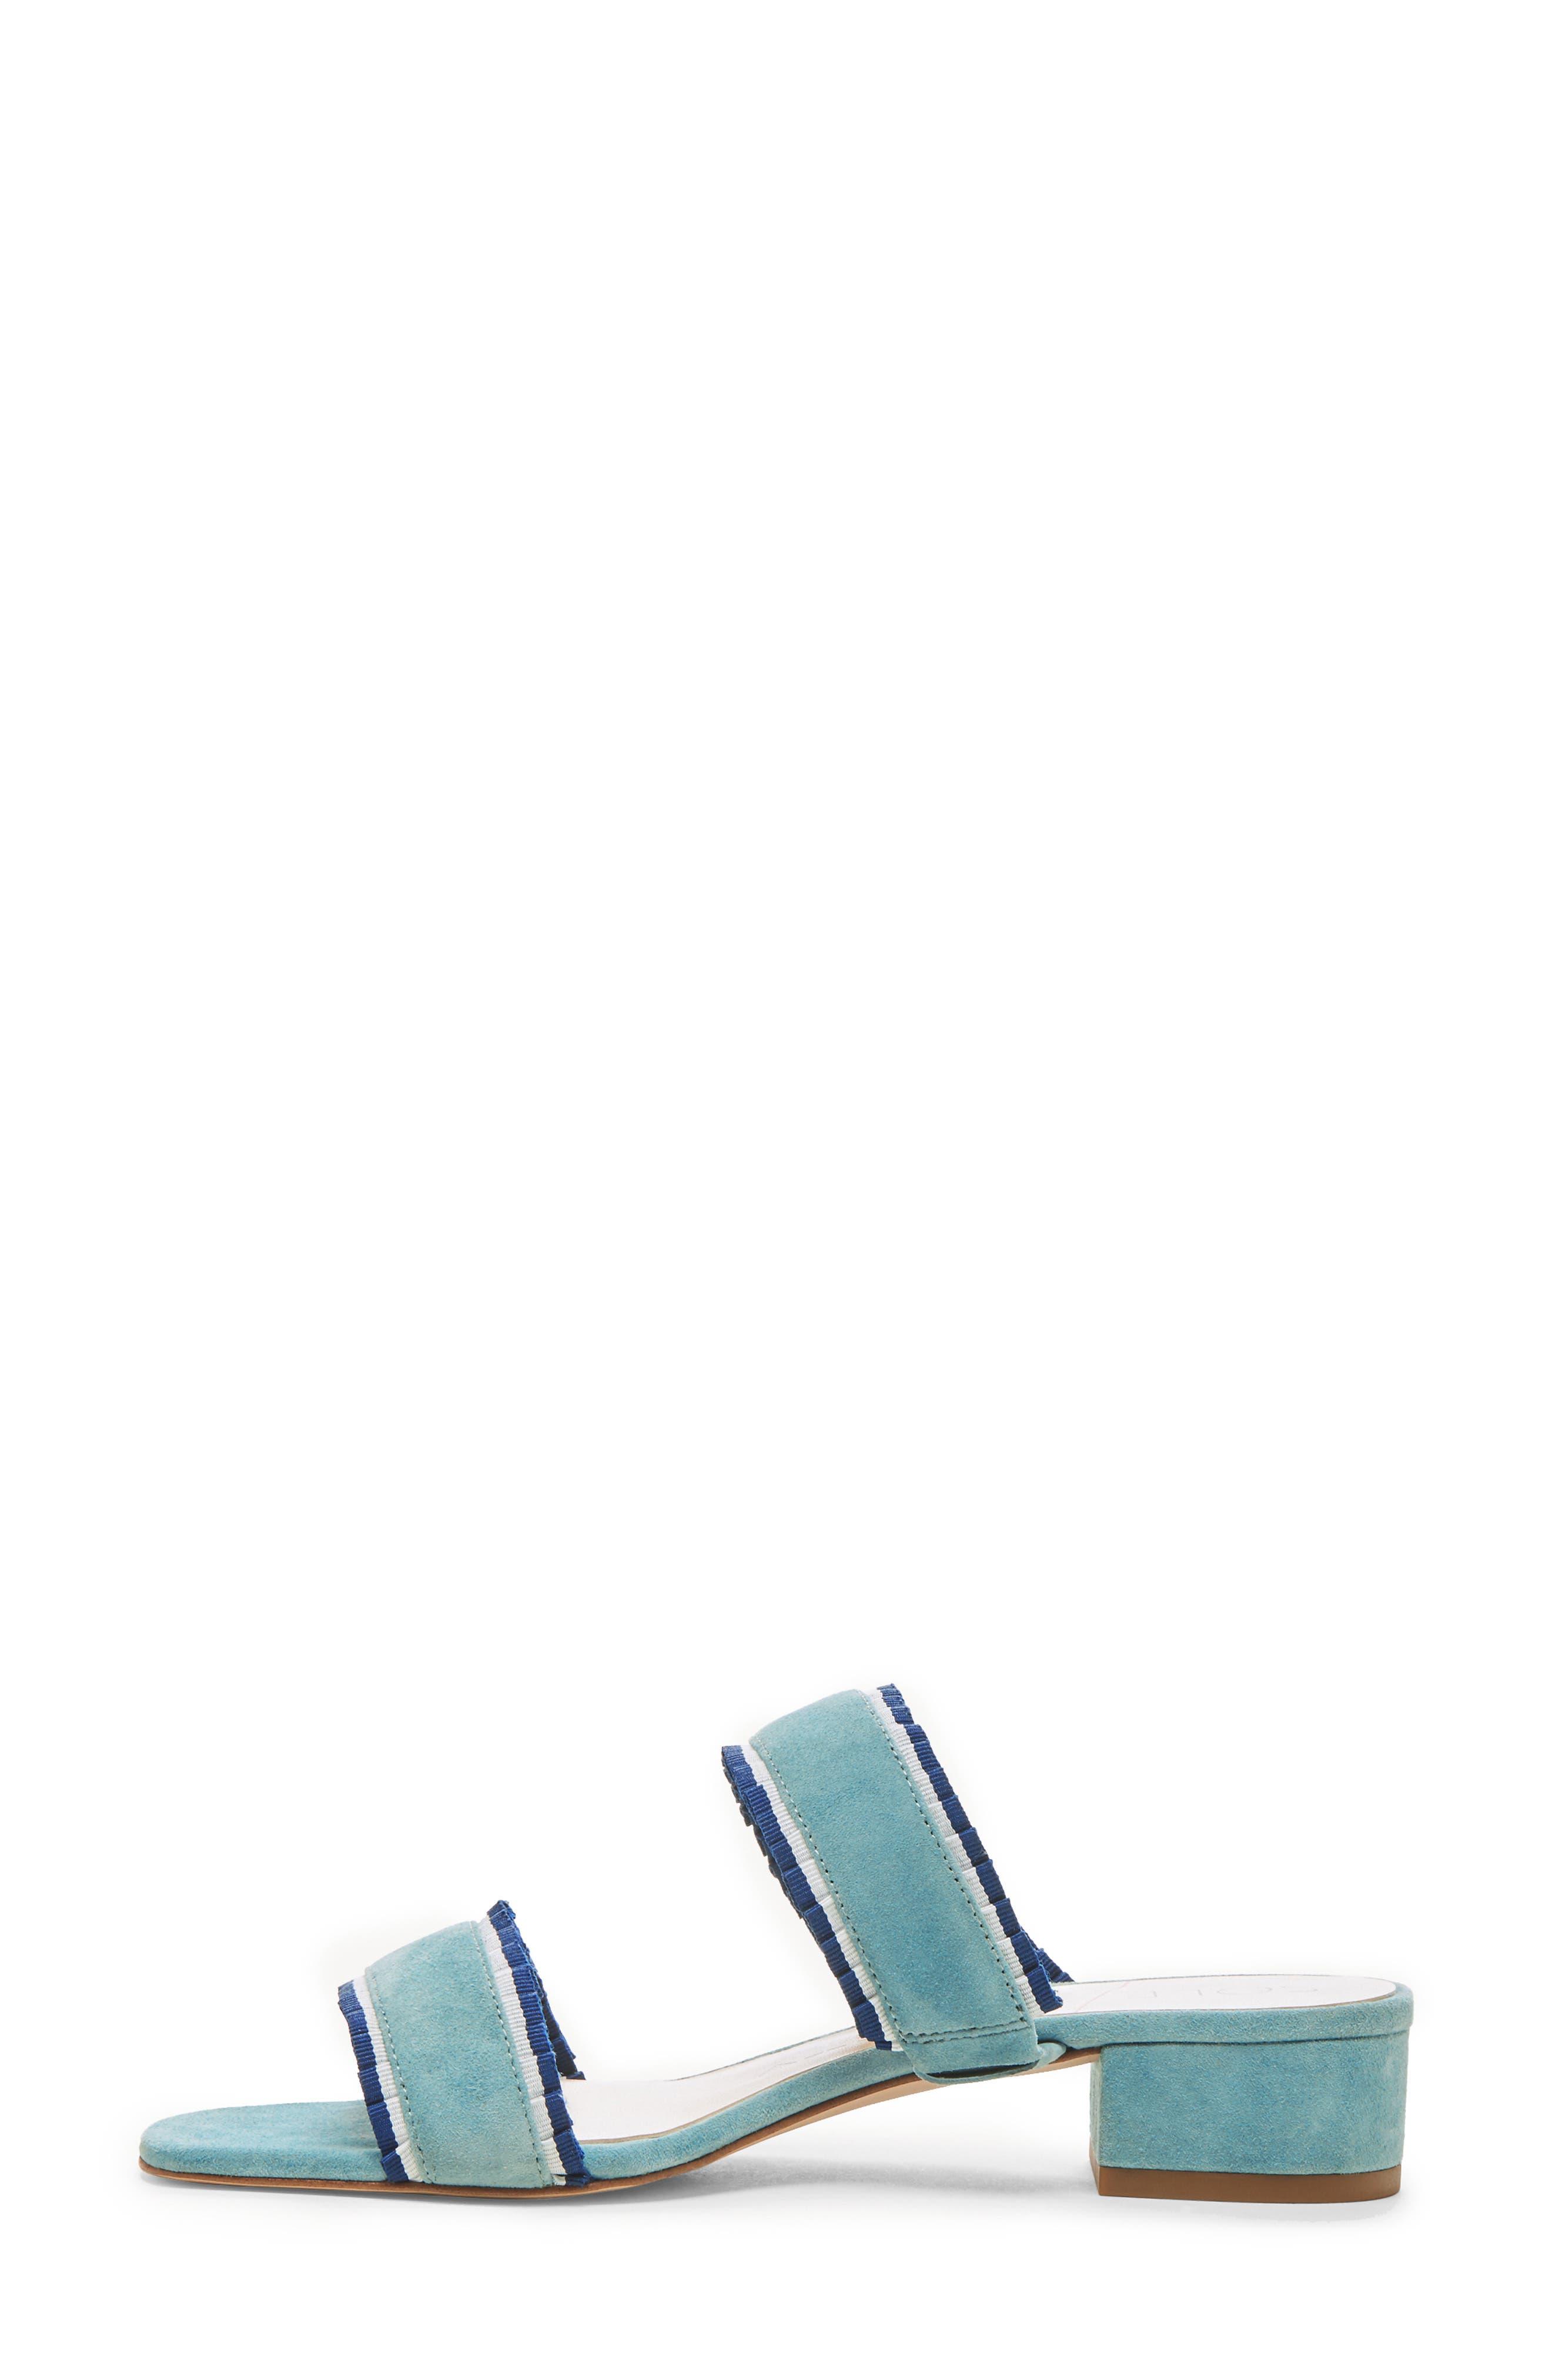 SOLE SOCIETY,                             Elura Slide Sandal,                             Alternate thumbnail 9, color,                             LIGHT SEA GREEN SUEDE